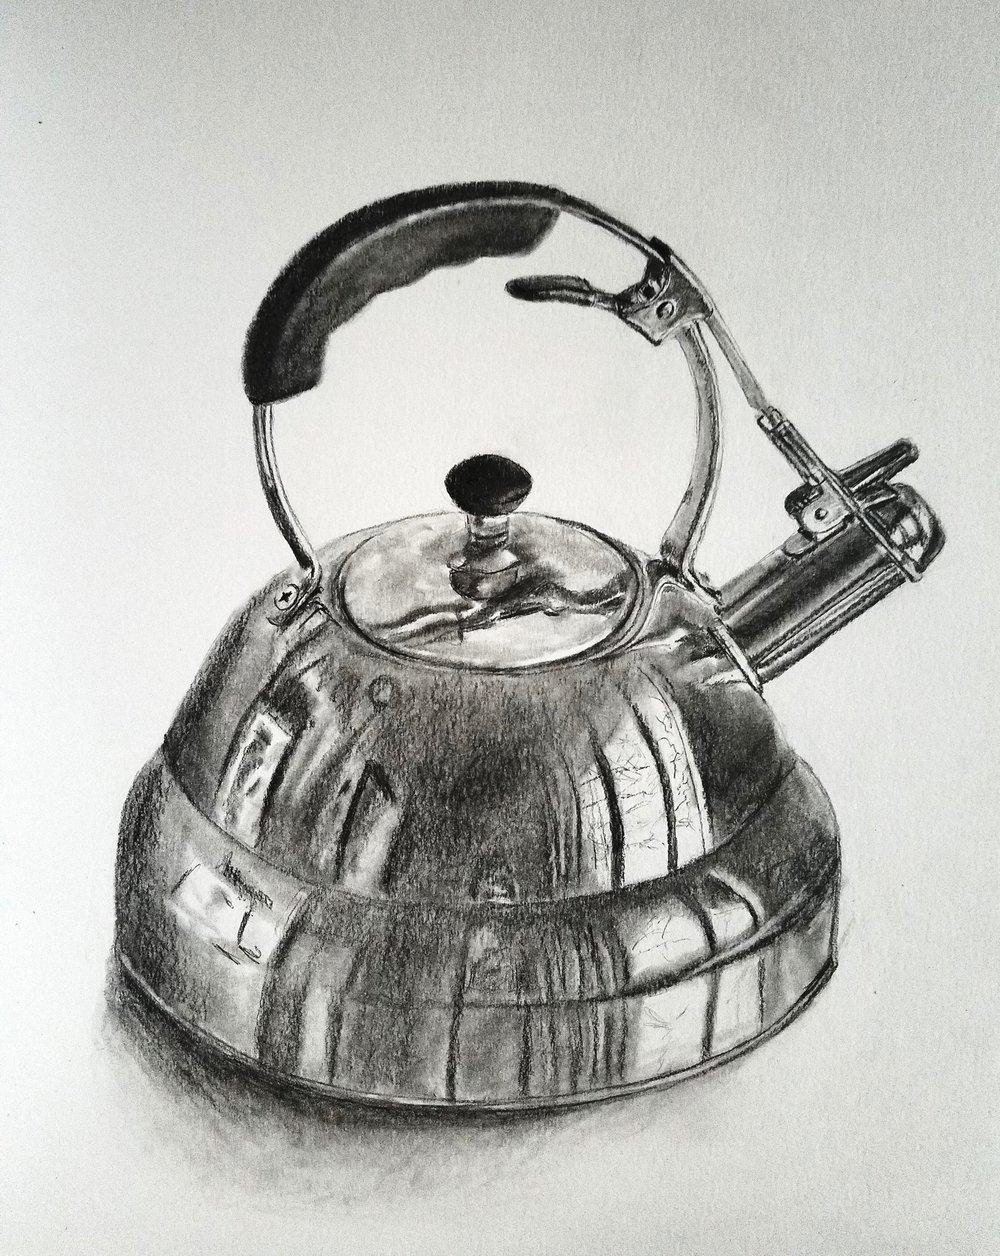 Tea Kettle; graphite; 2018